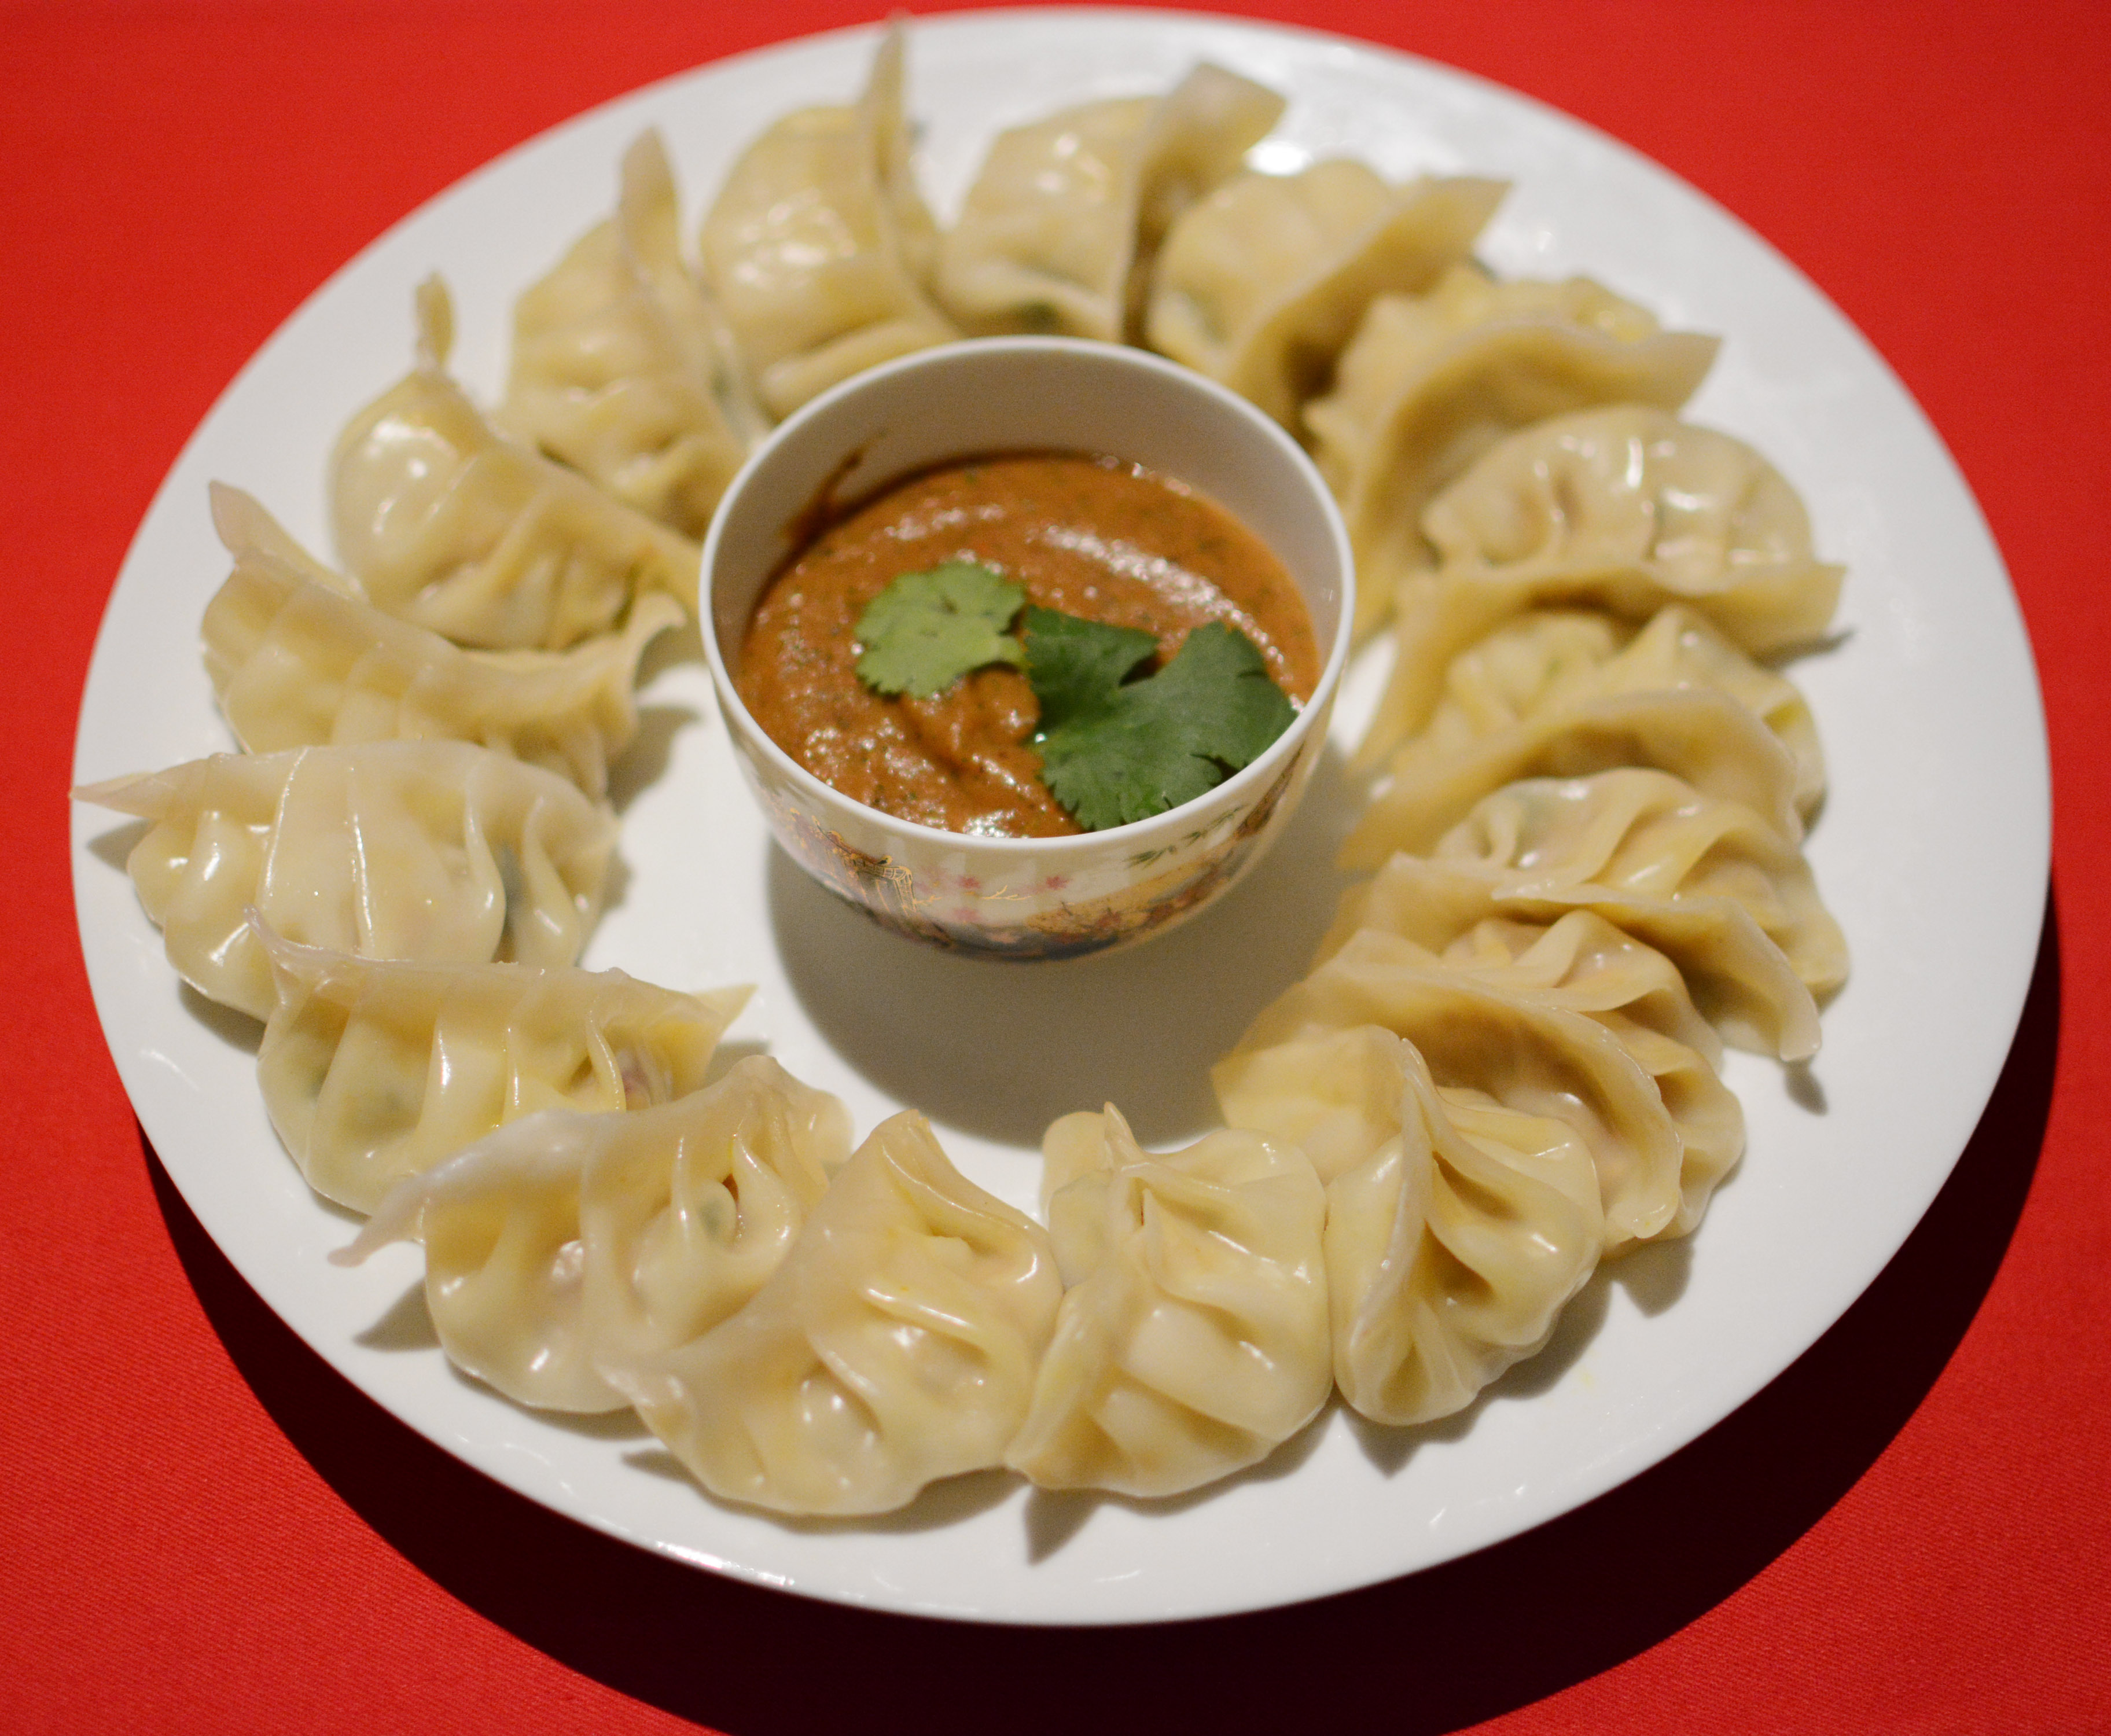 File:Nepali Momo.jpg - Wikimedia Commons